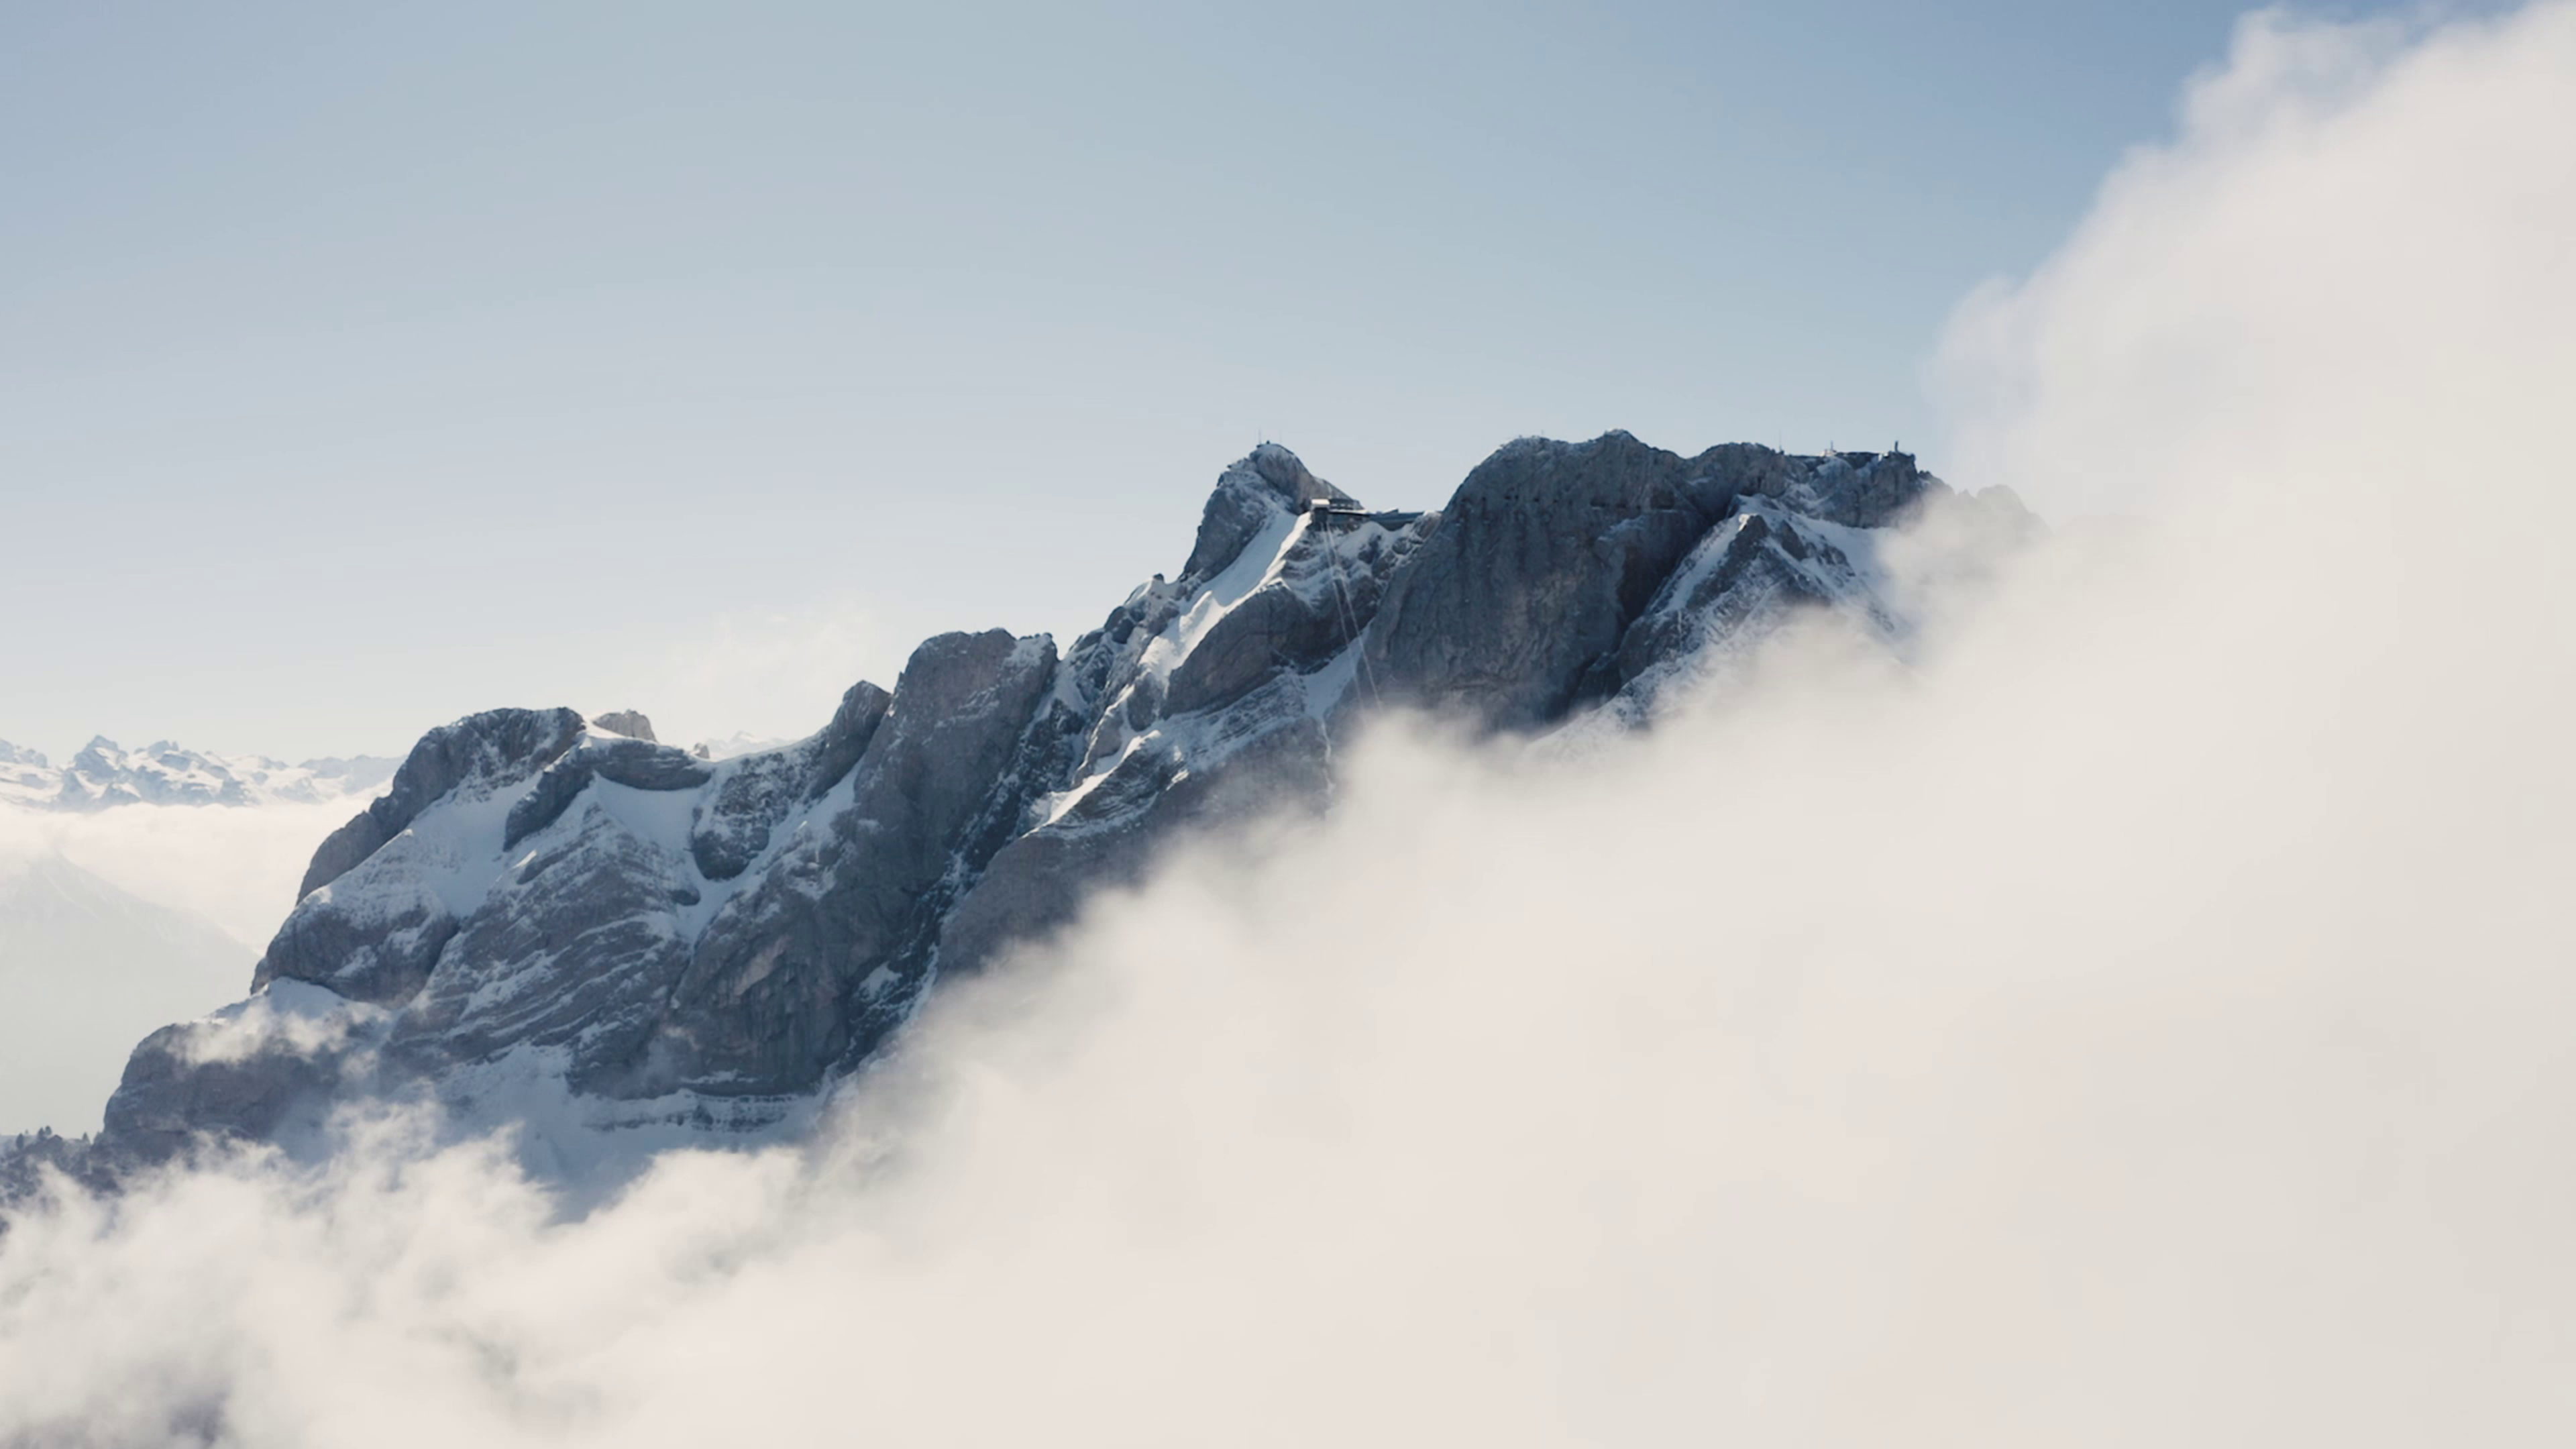 Skiurlaub-Skireisen Schweiz St. Moritz - Singlereisen